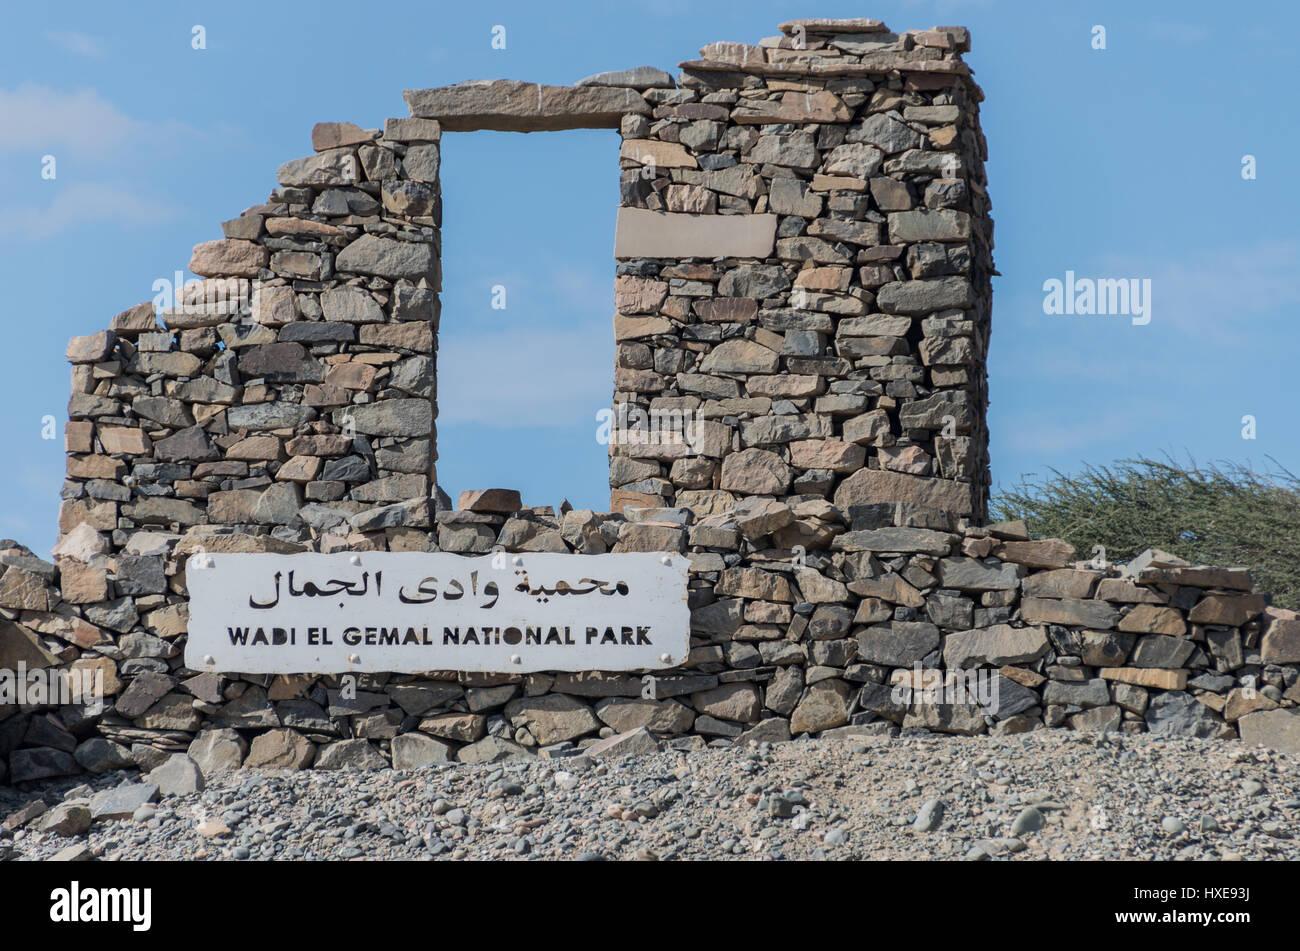 Wadi Gamal National Park, Upper Egypt - Stock Image